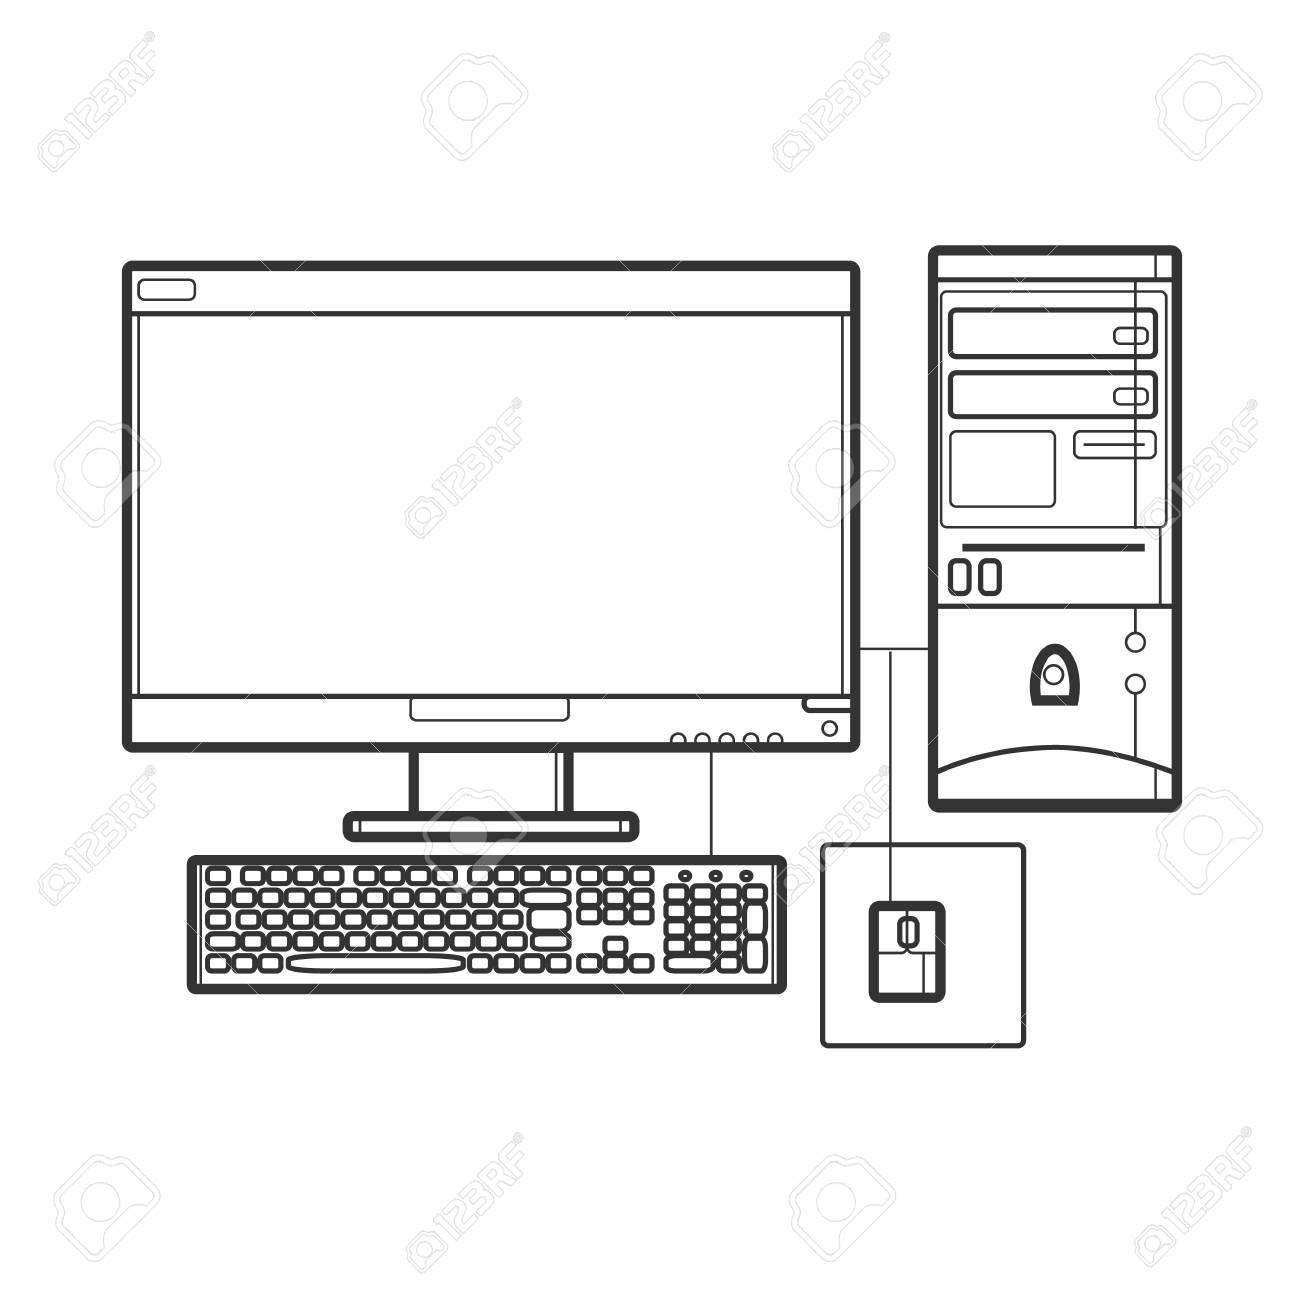 Symbol Desktop Computer Icon For Web Site Line Art Illustration